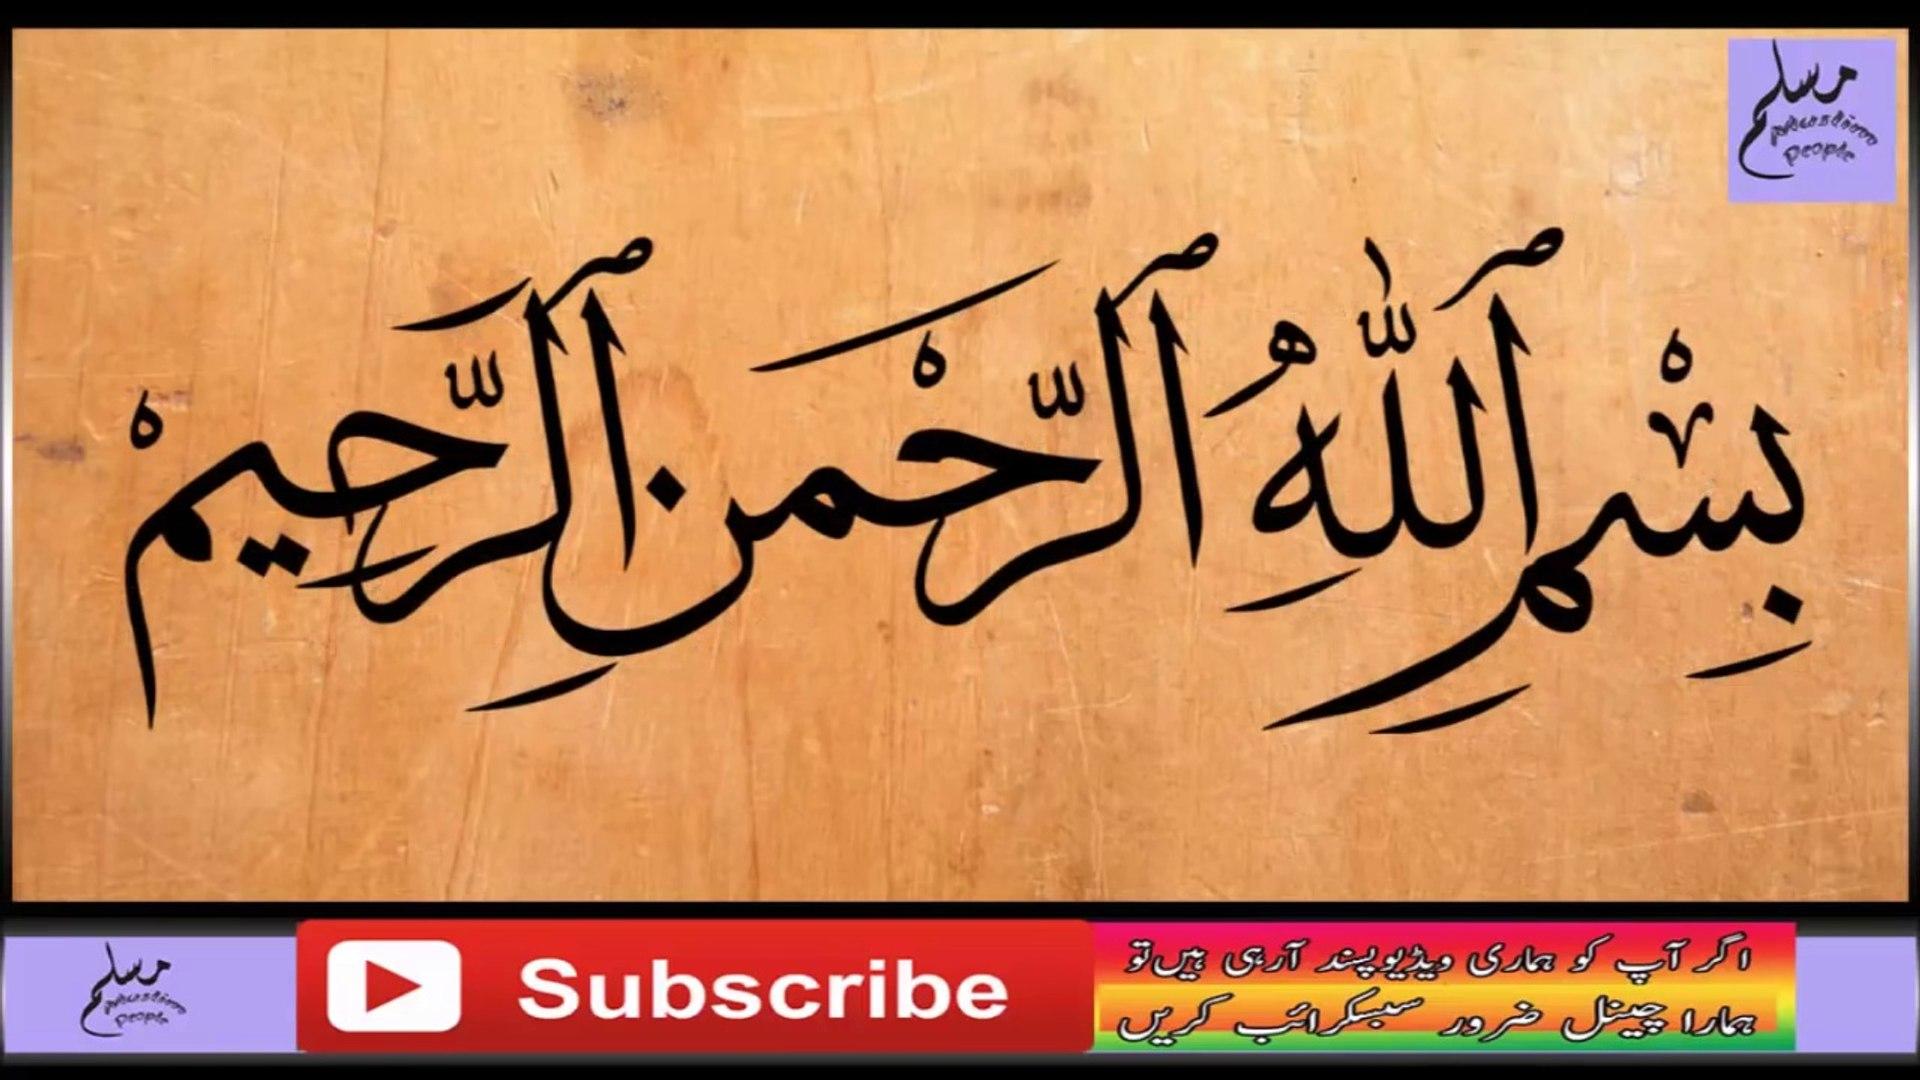 Ya Fattahu Wazifa - Ya Fattahu Benefits - الله کے نام کا ورد اور فائدے -  Muslim People